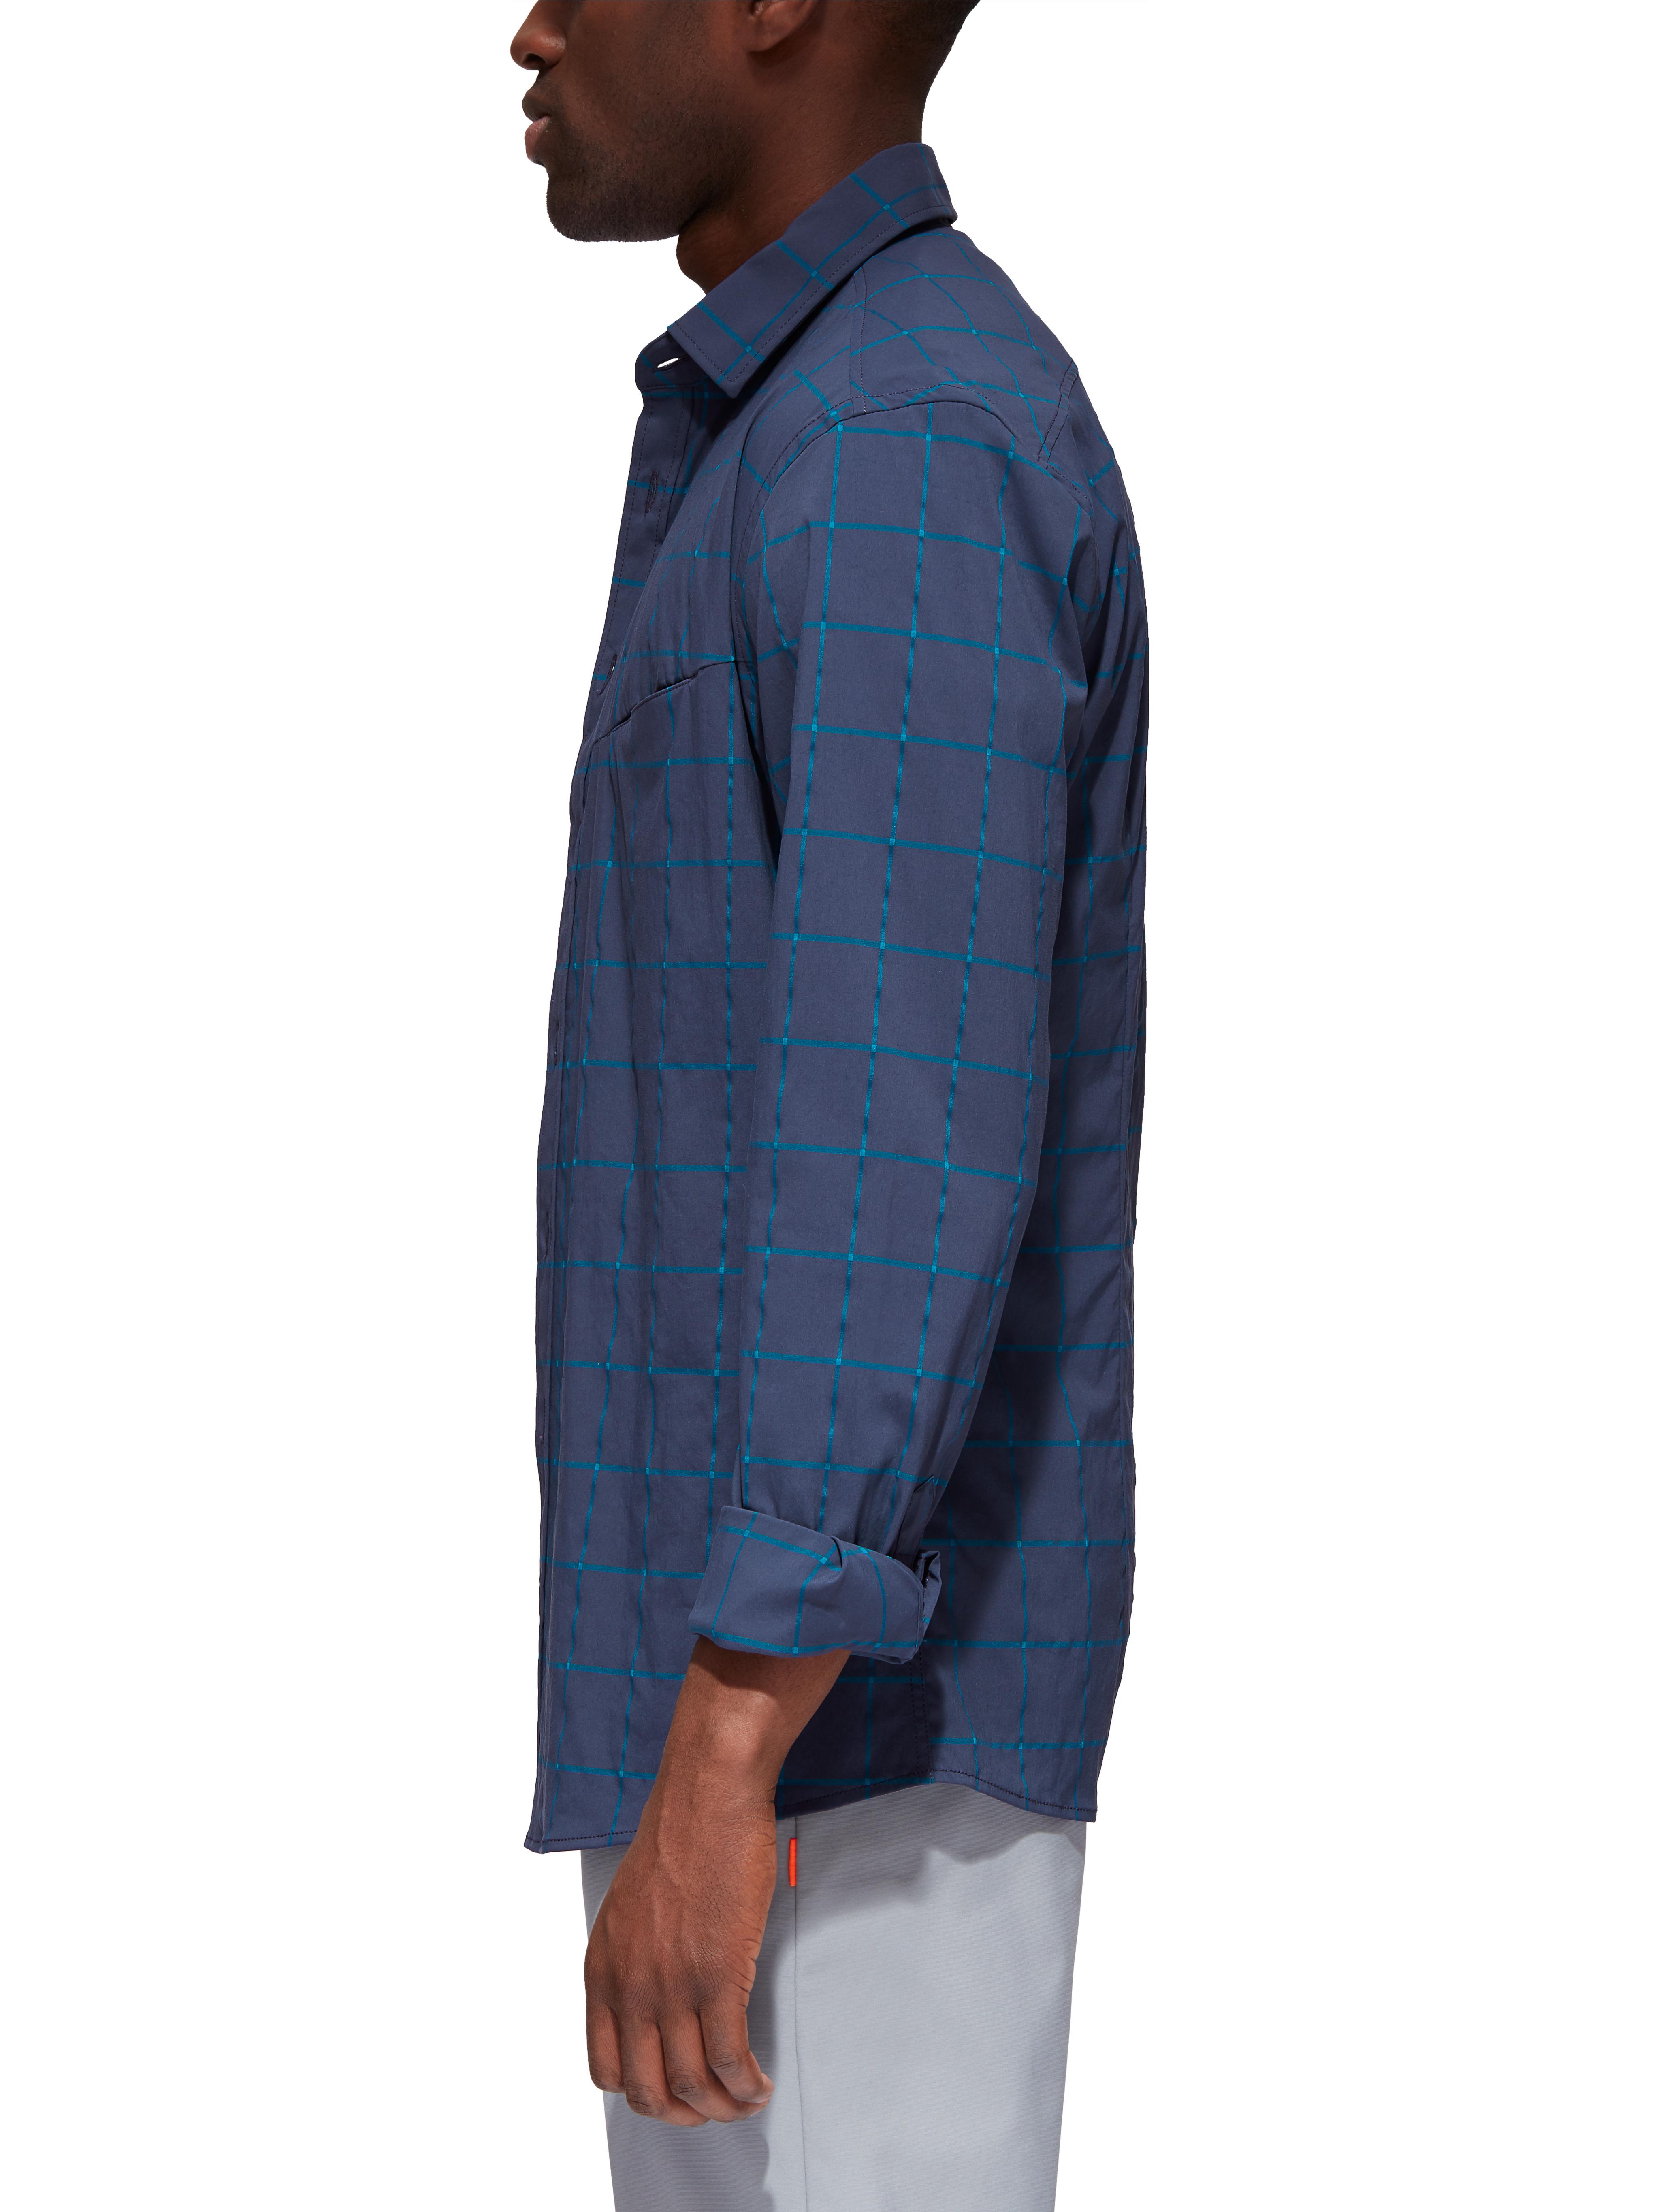 Mountain Longsleeve Shirt Men product image